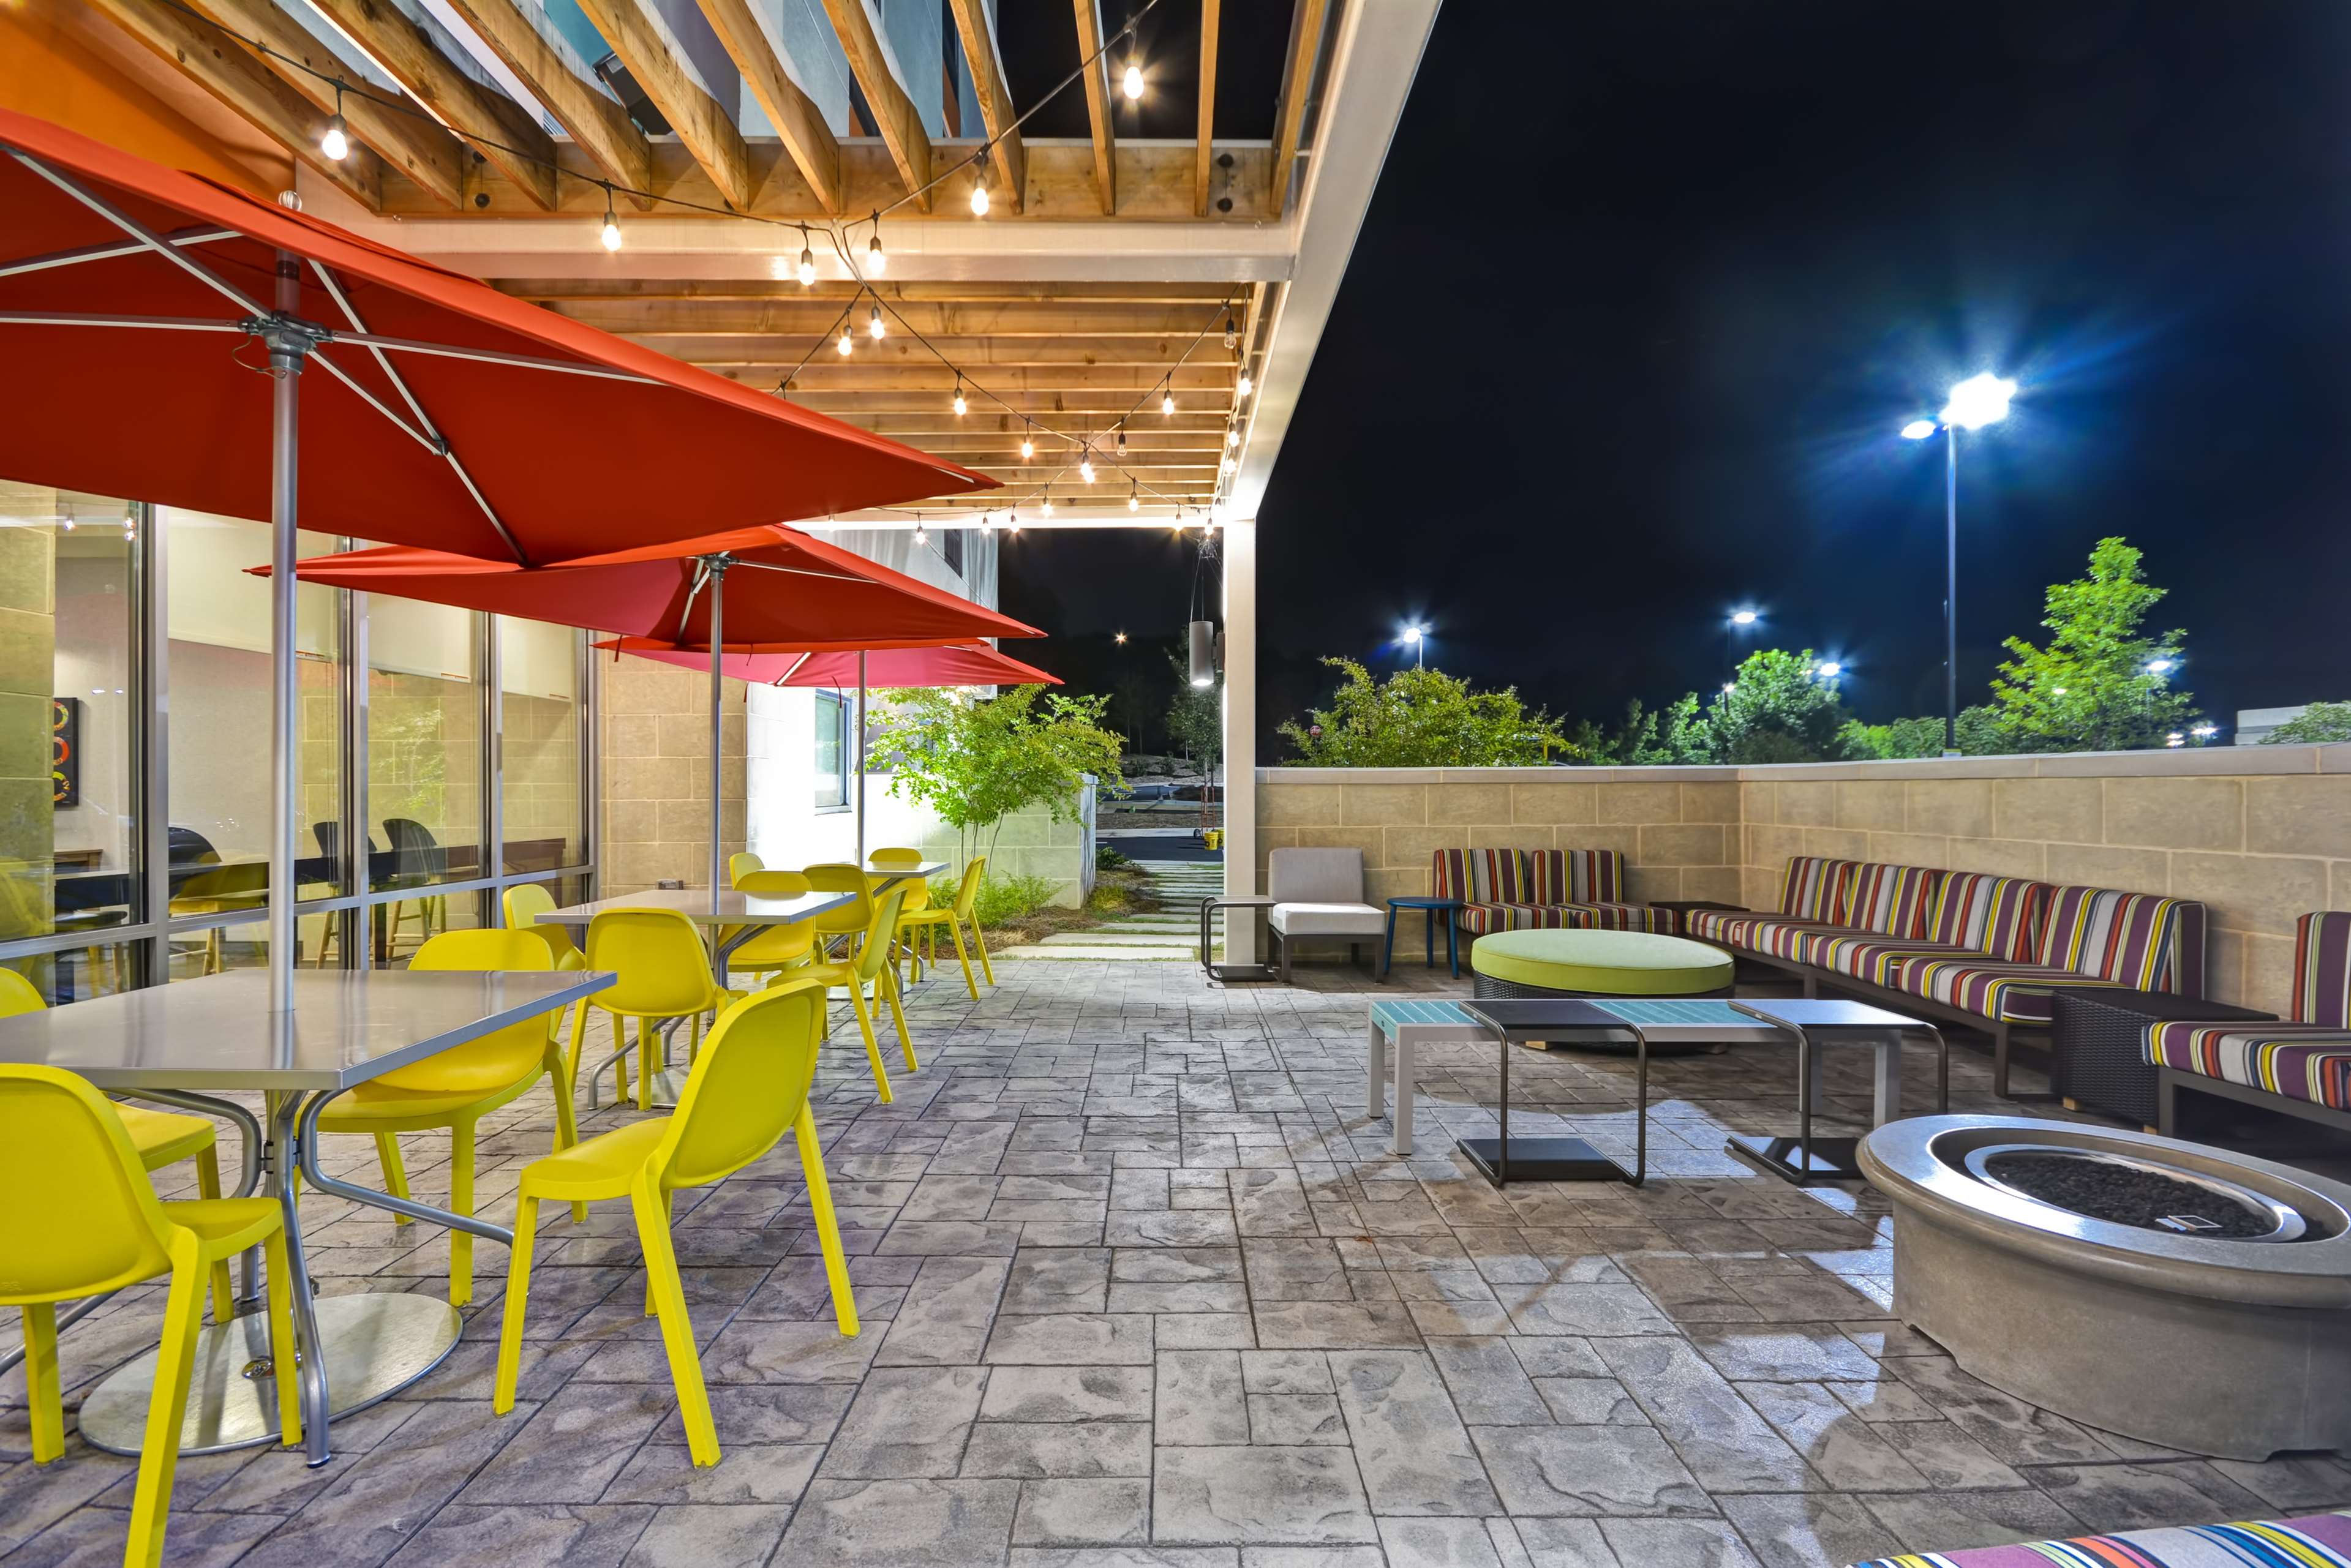 Home2 Suites by Hilton Atlanta West Lithia Springs image 6